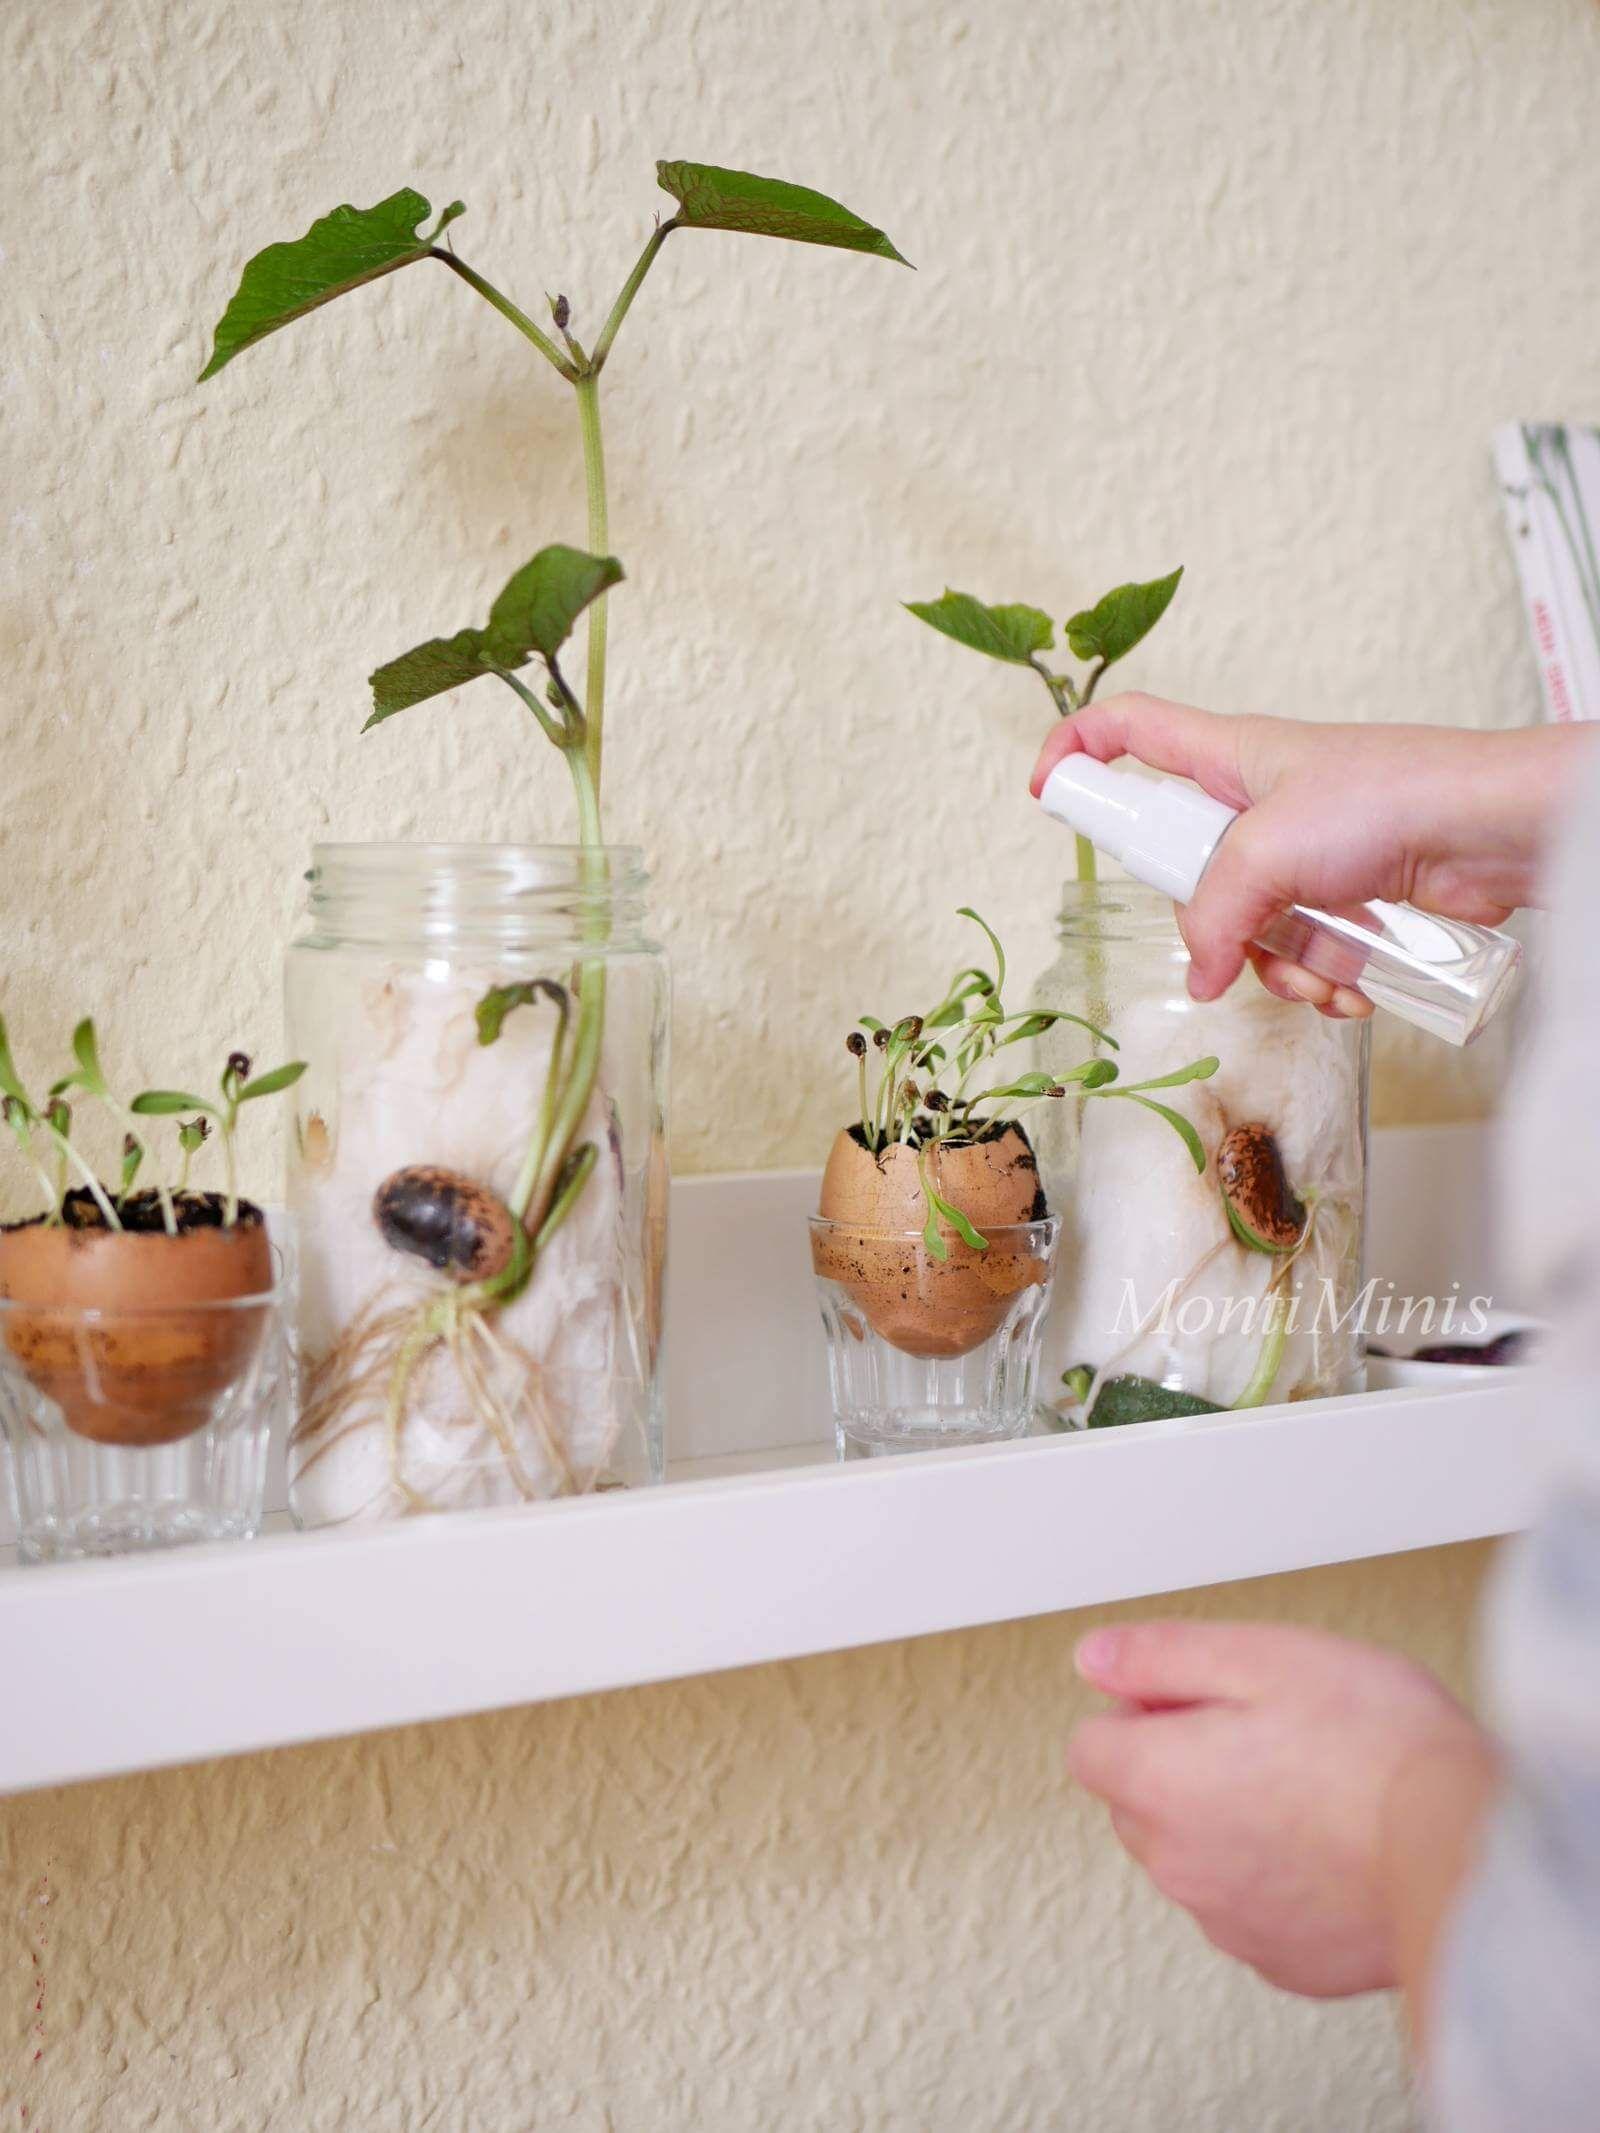 Photo of Exciting plant experiments for children – Montessori blog – MontiMinis